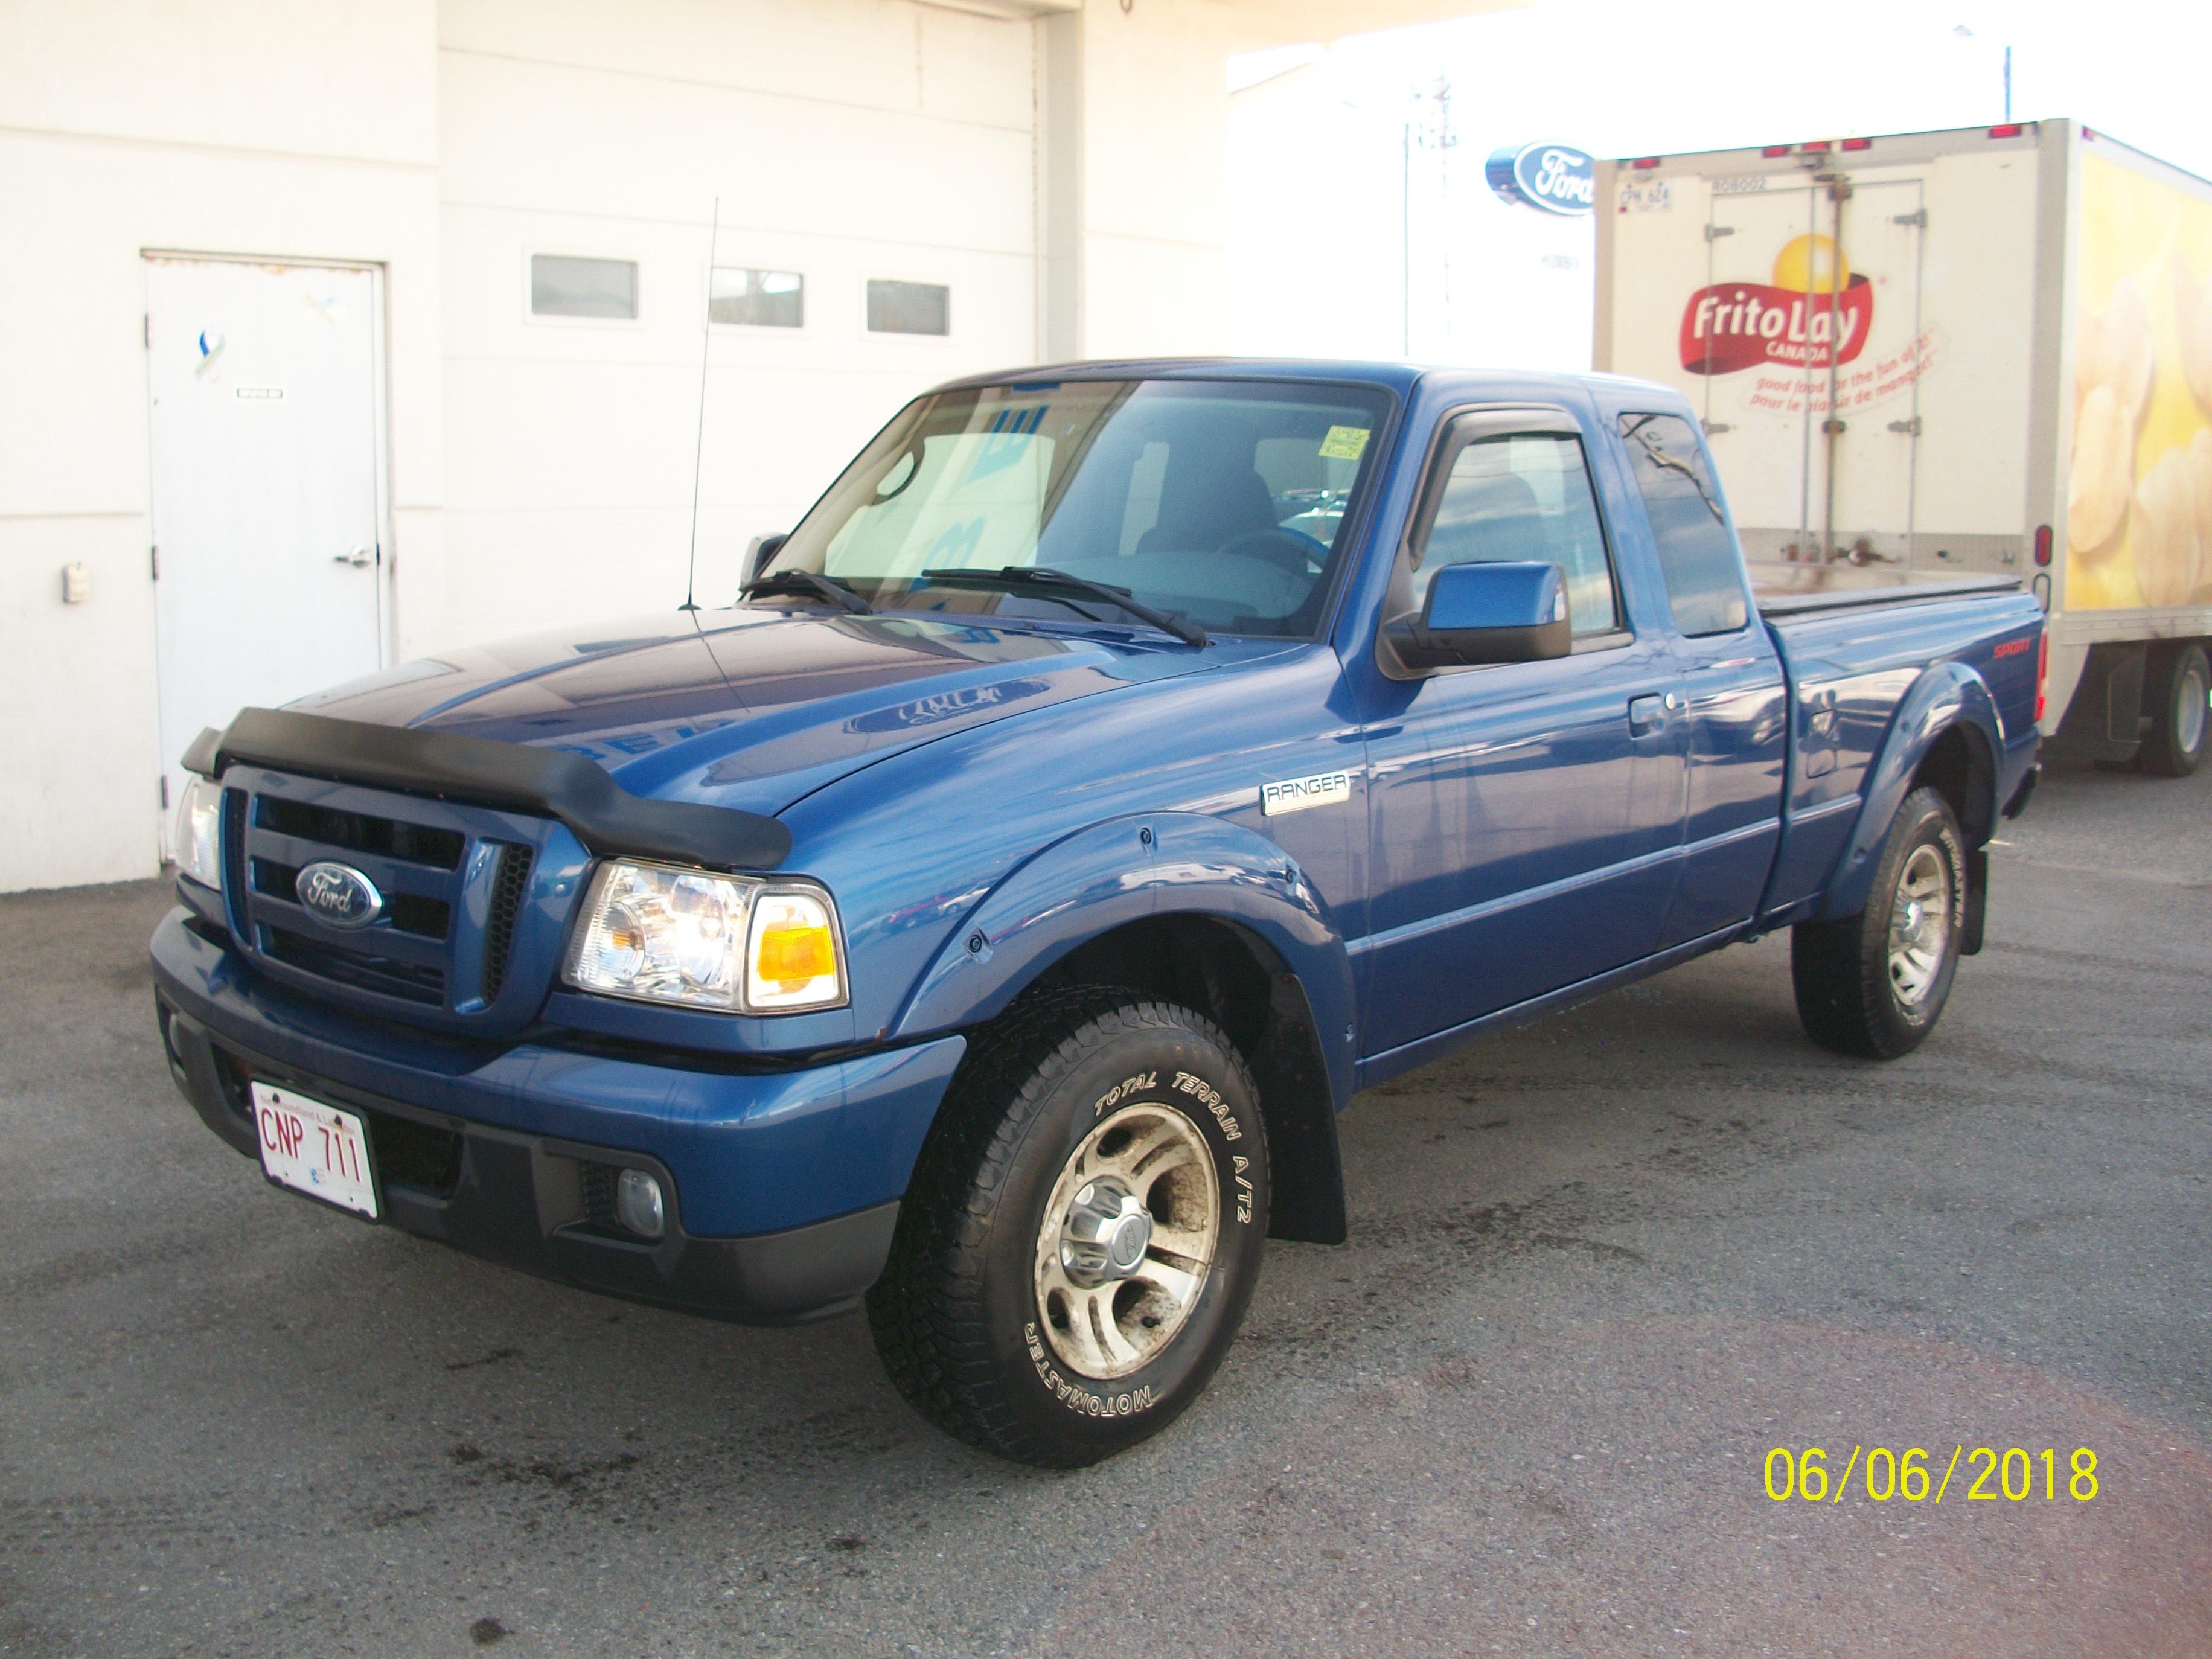 f inventory vehicle owned on used raptor dealer for ford vehicles area svt kaladar trucks car pre sale